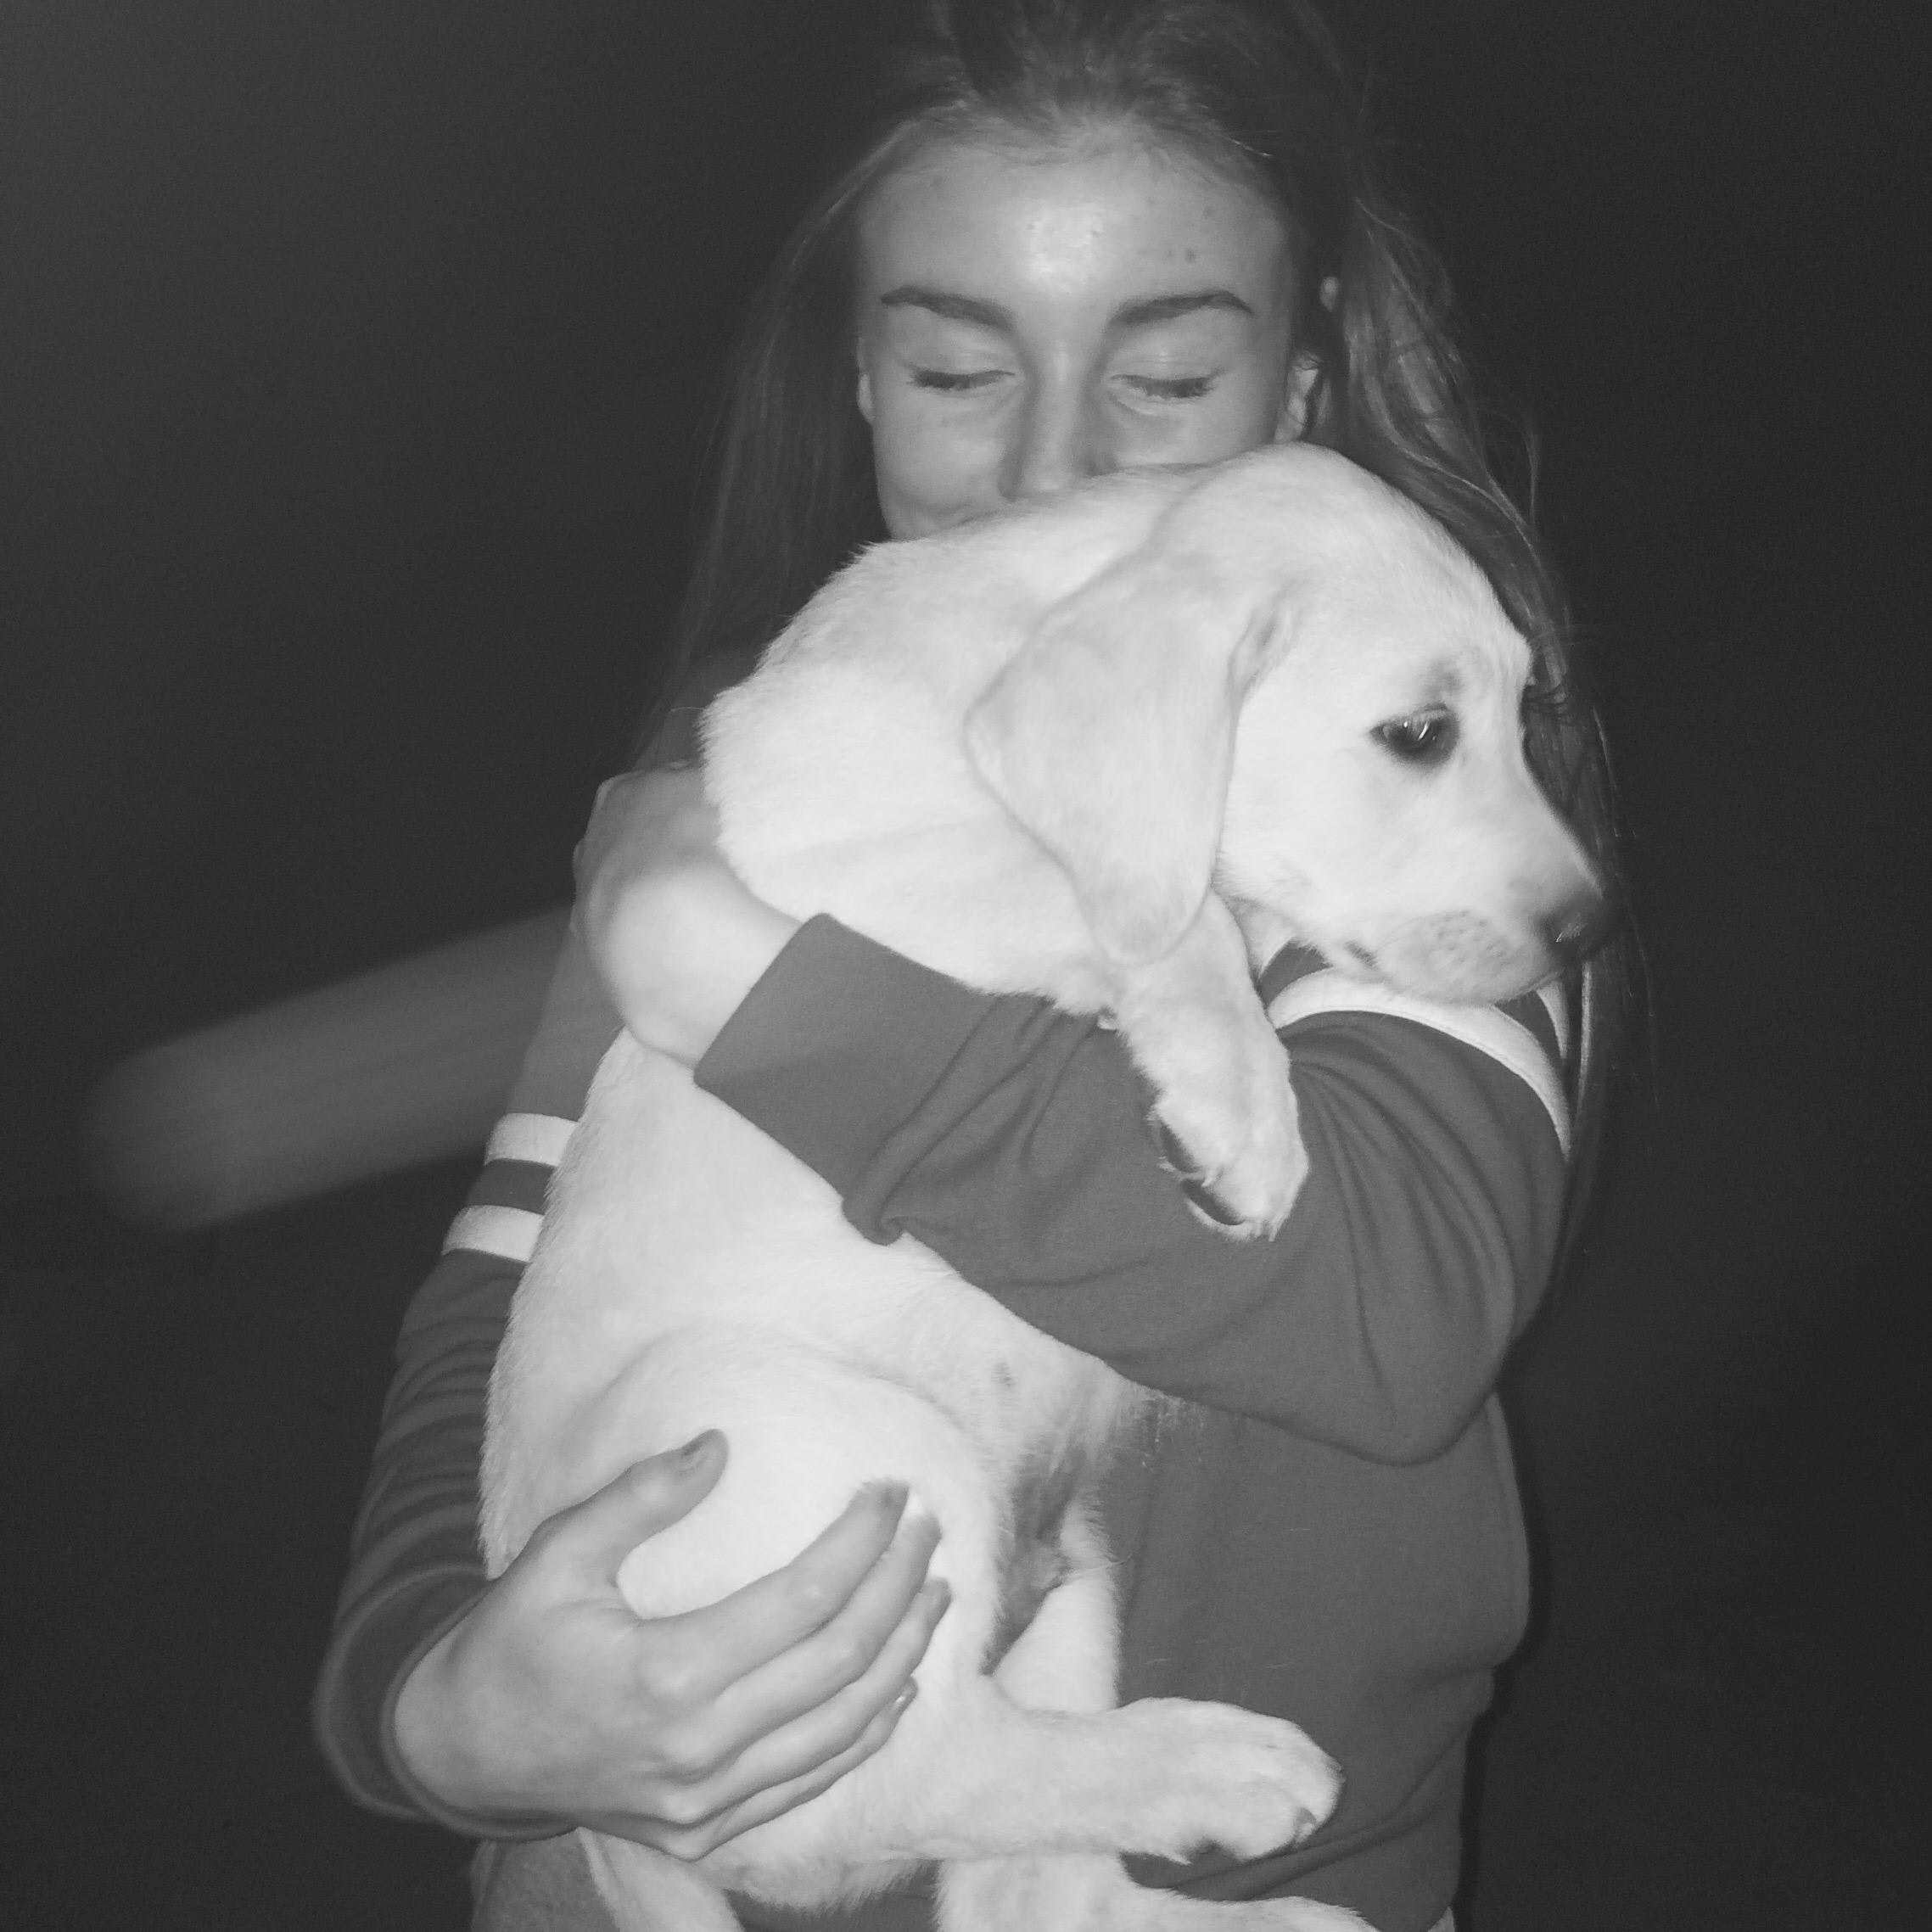 Sage's dog day care